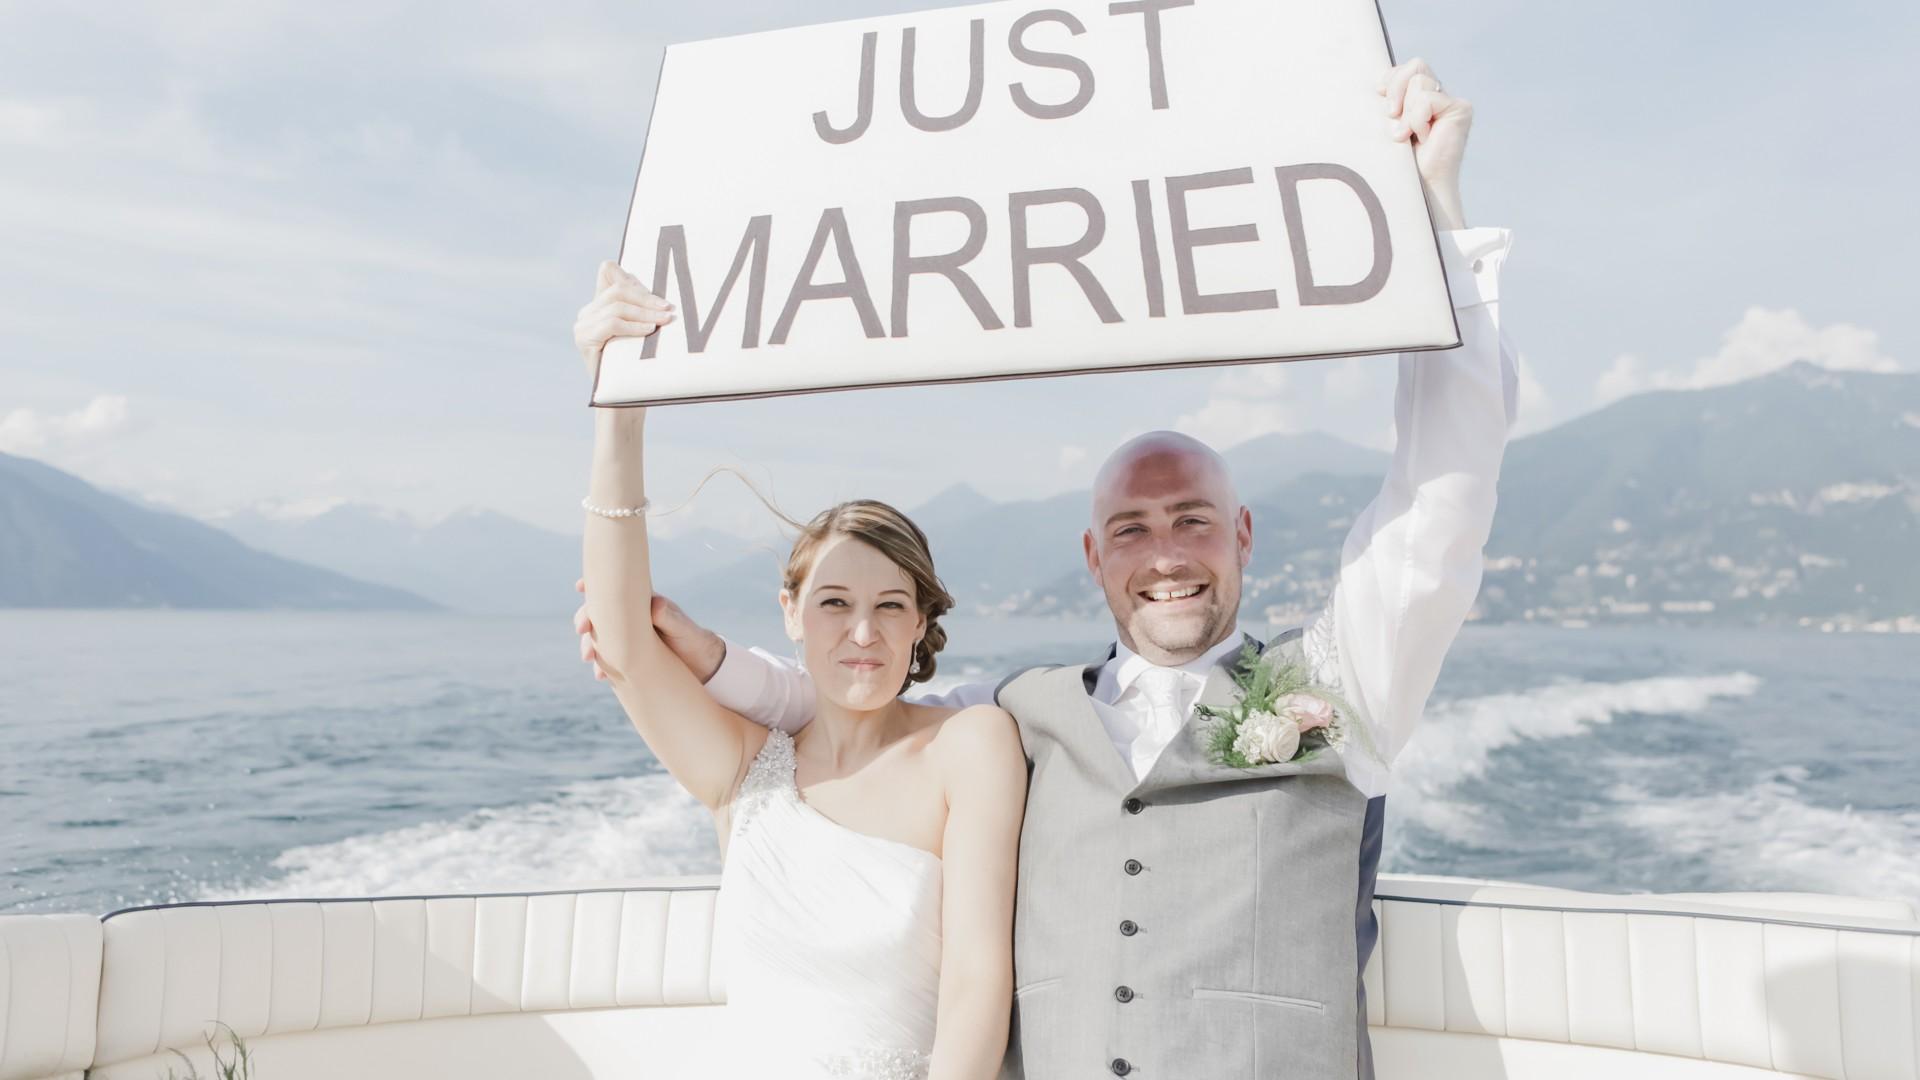 VARENNA MATRIMONIO IN VILLA CIPRESSI LAGO DI COMO